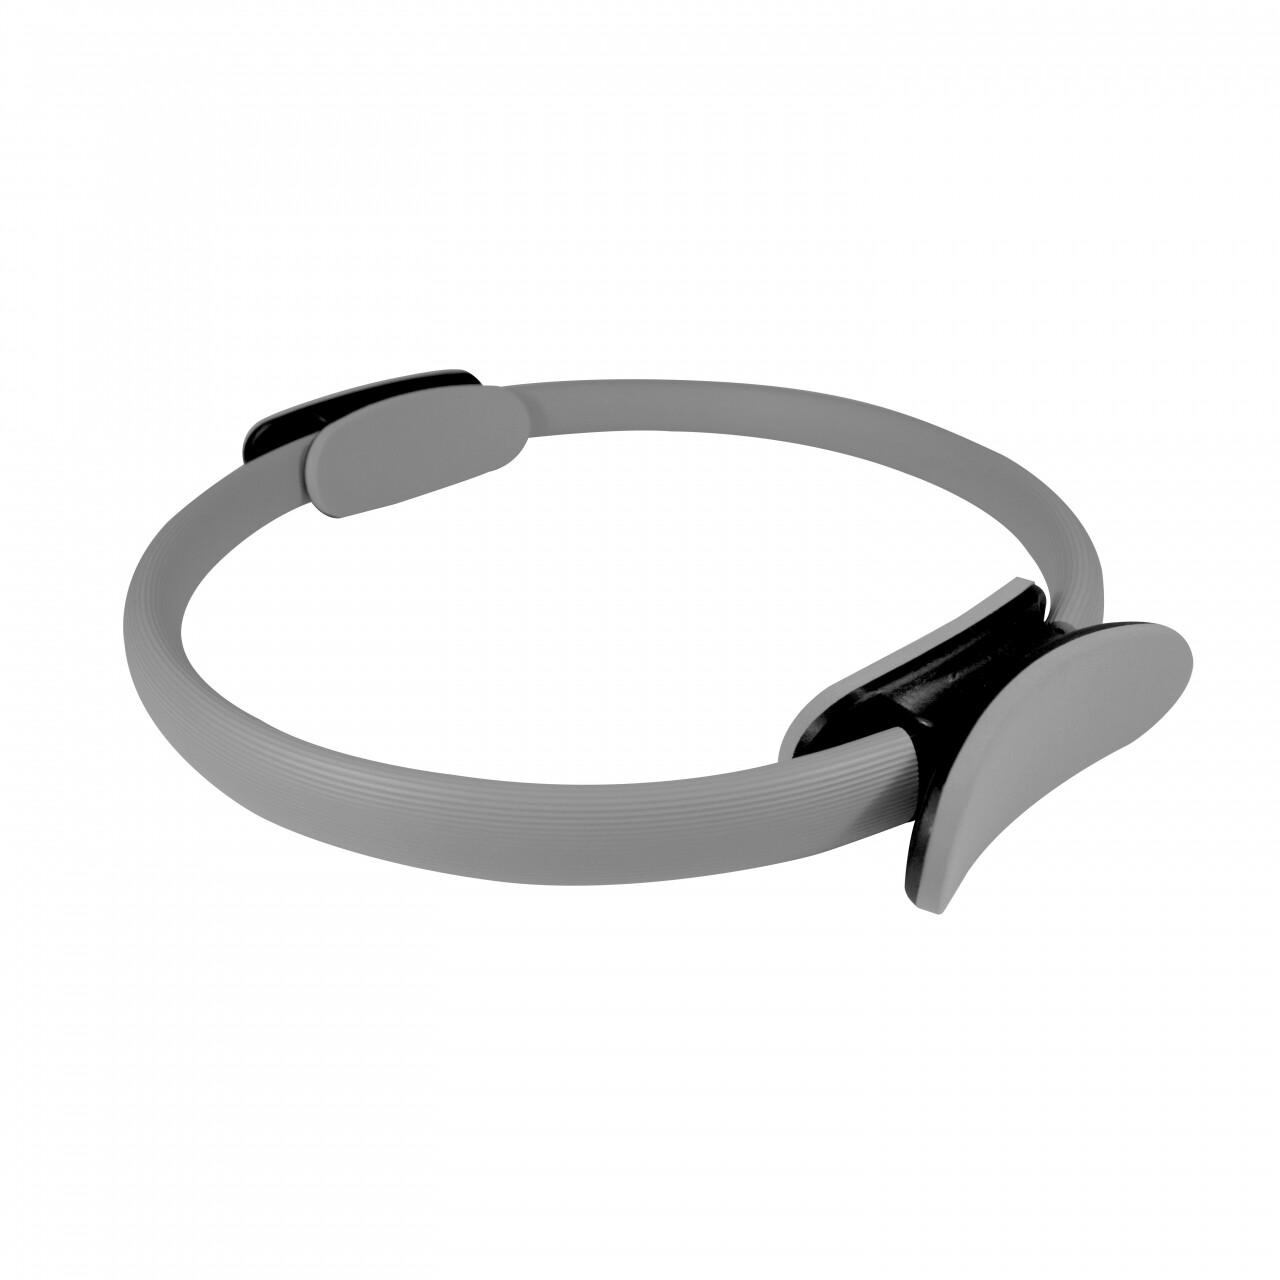 Inel Jocca pentru Pilates Grey Ø 38 cm